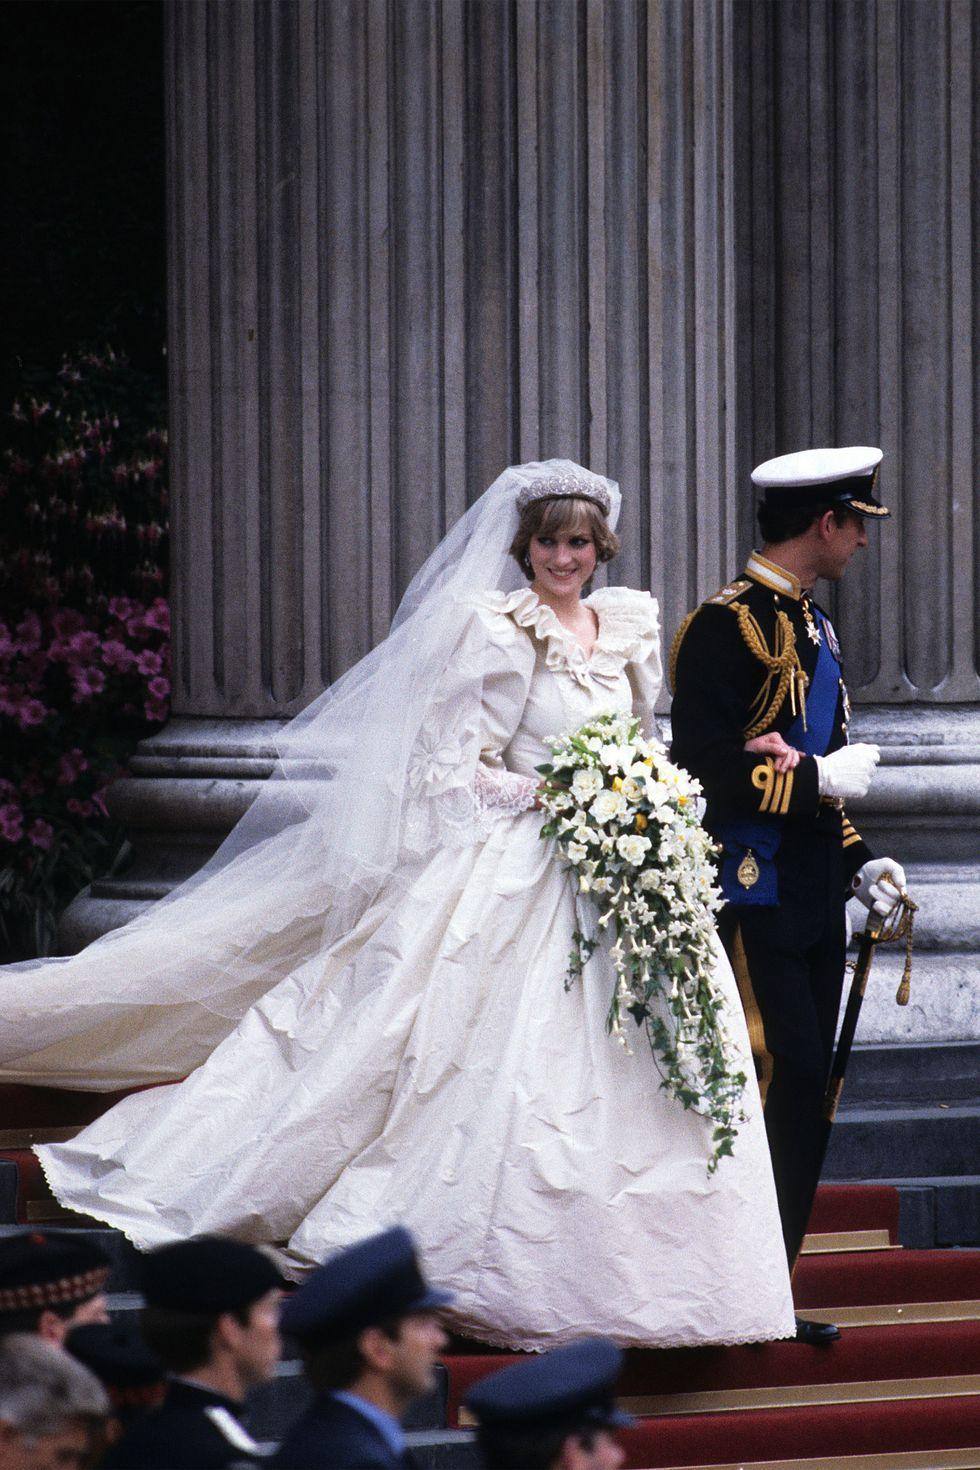 Masih jadi salah satu gaun pengantin paling mewah yang pernah ada hingga sekarang.